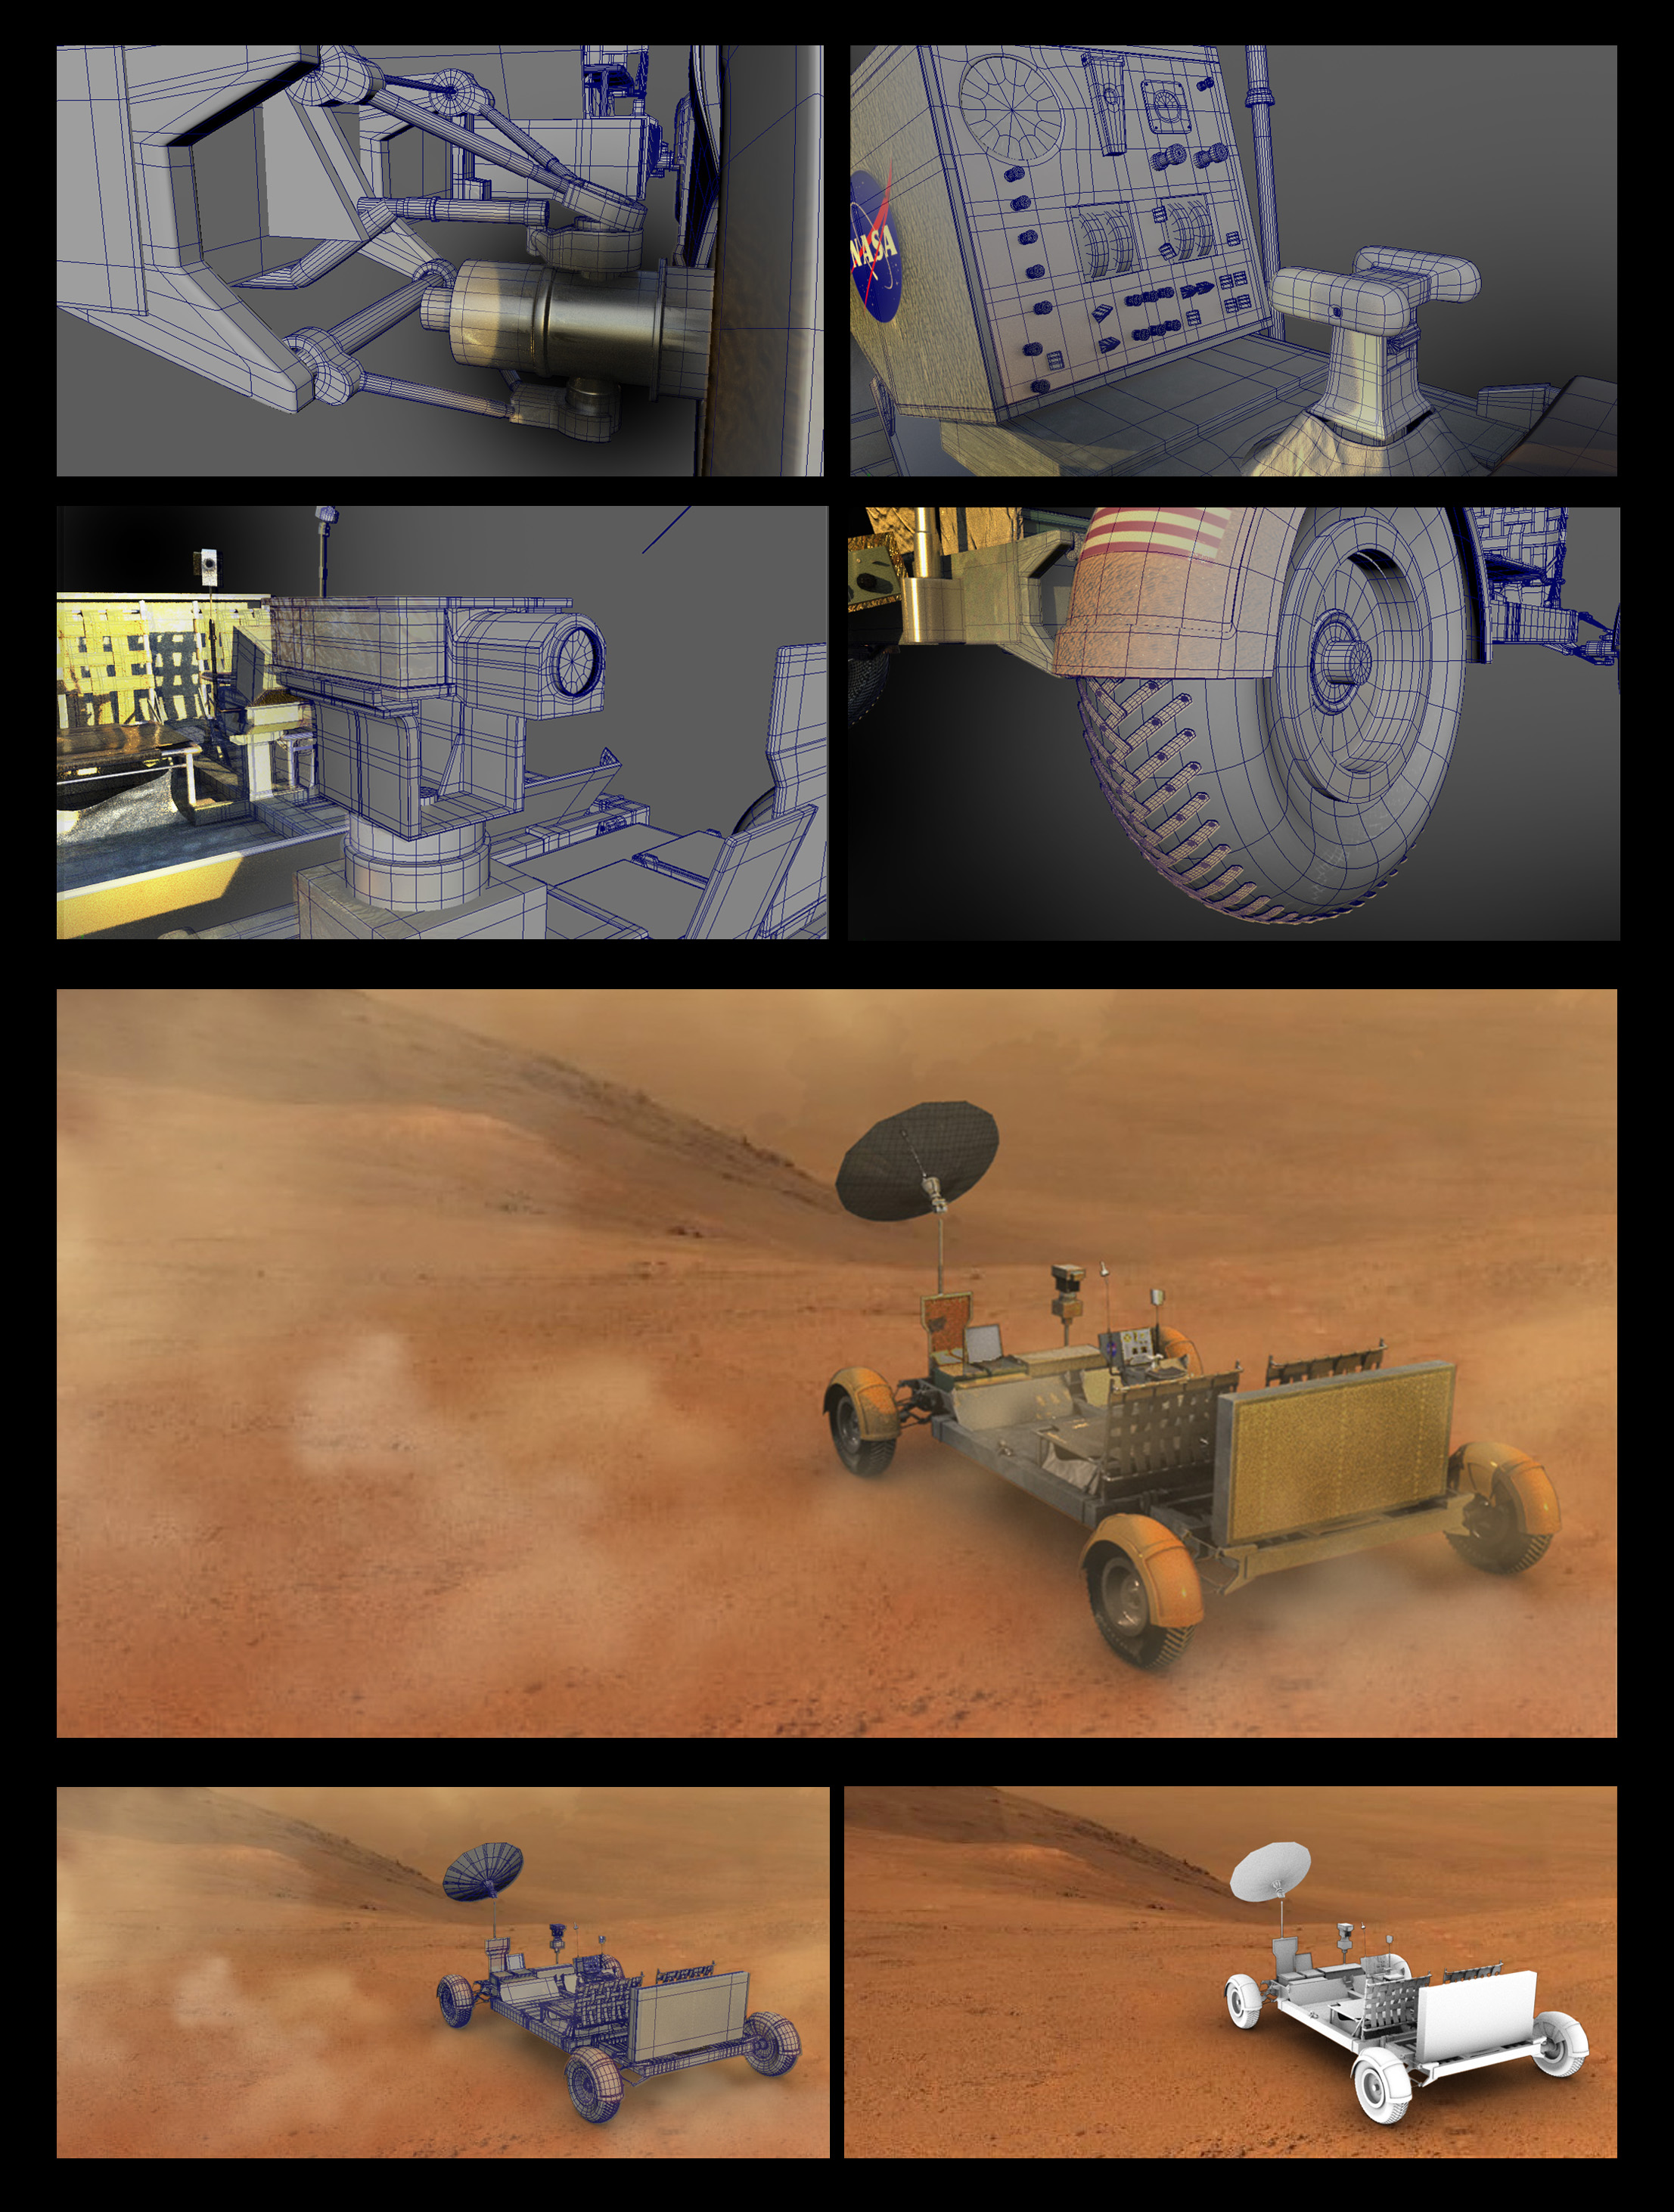 moon_rover_process.jpg